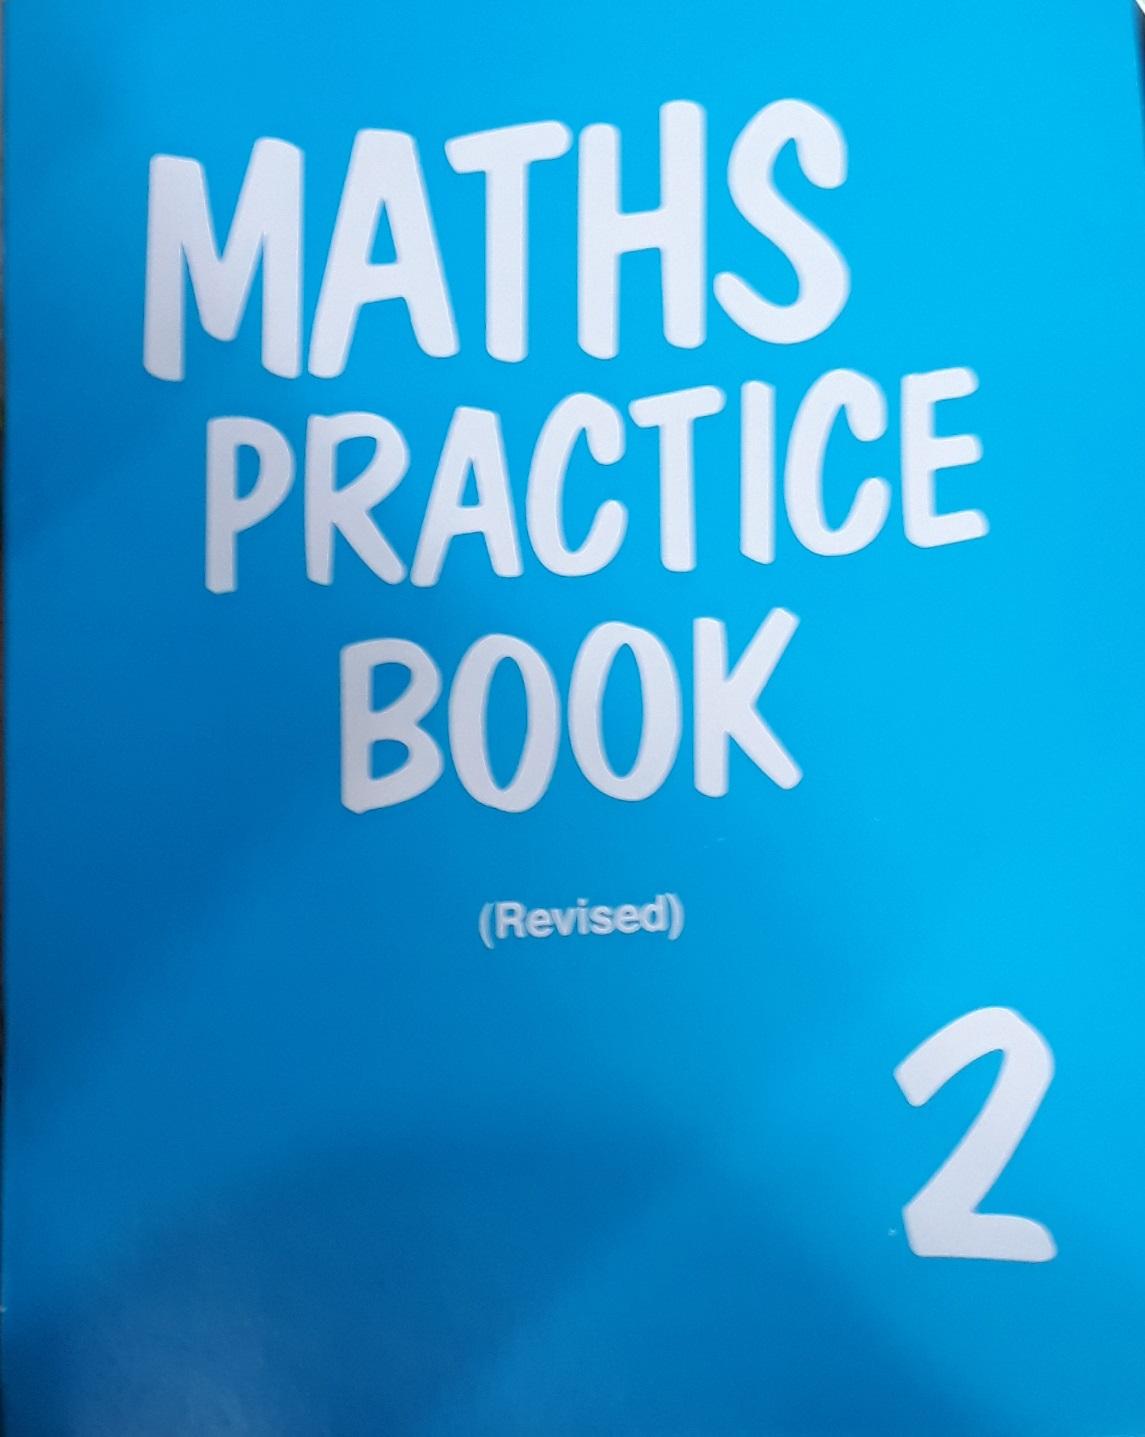 MATHS PRACTICE BOOK – 2